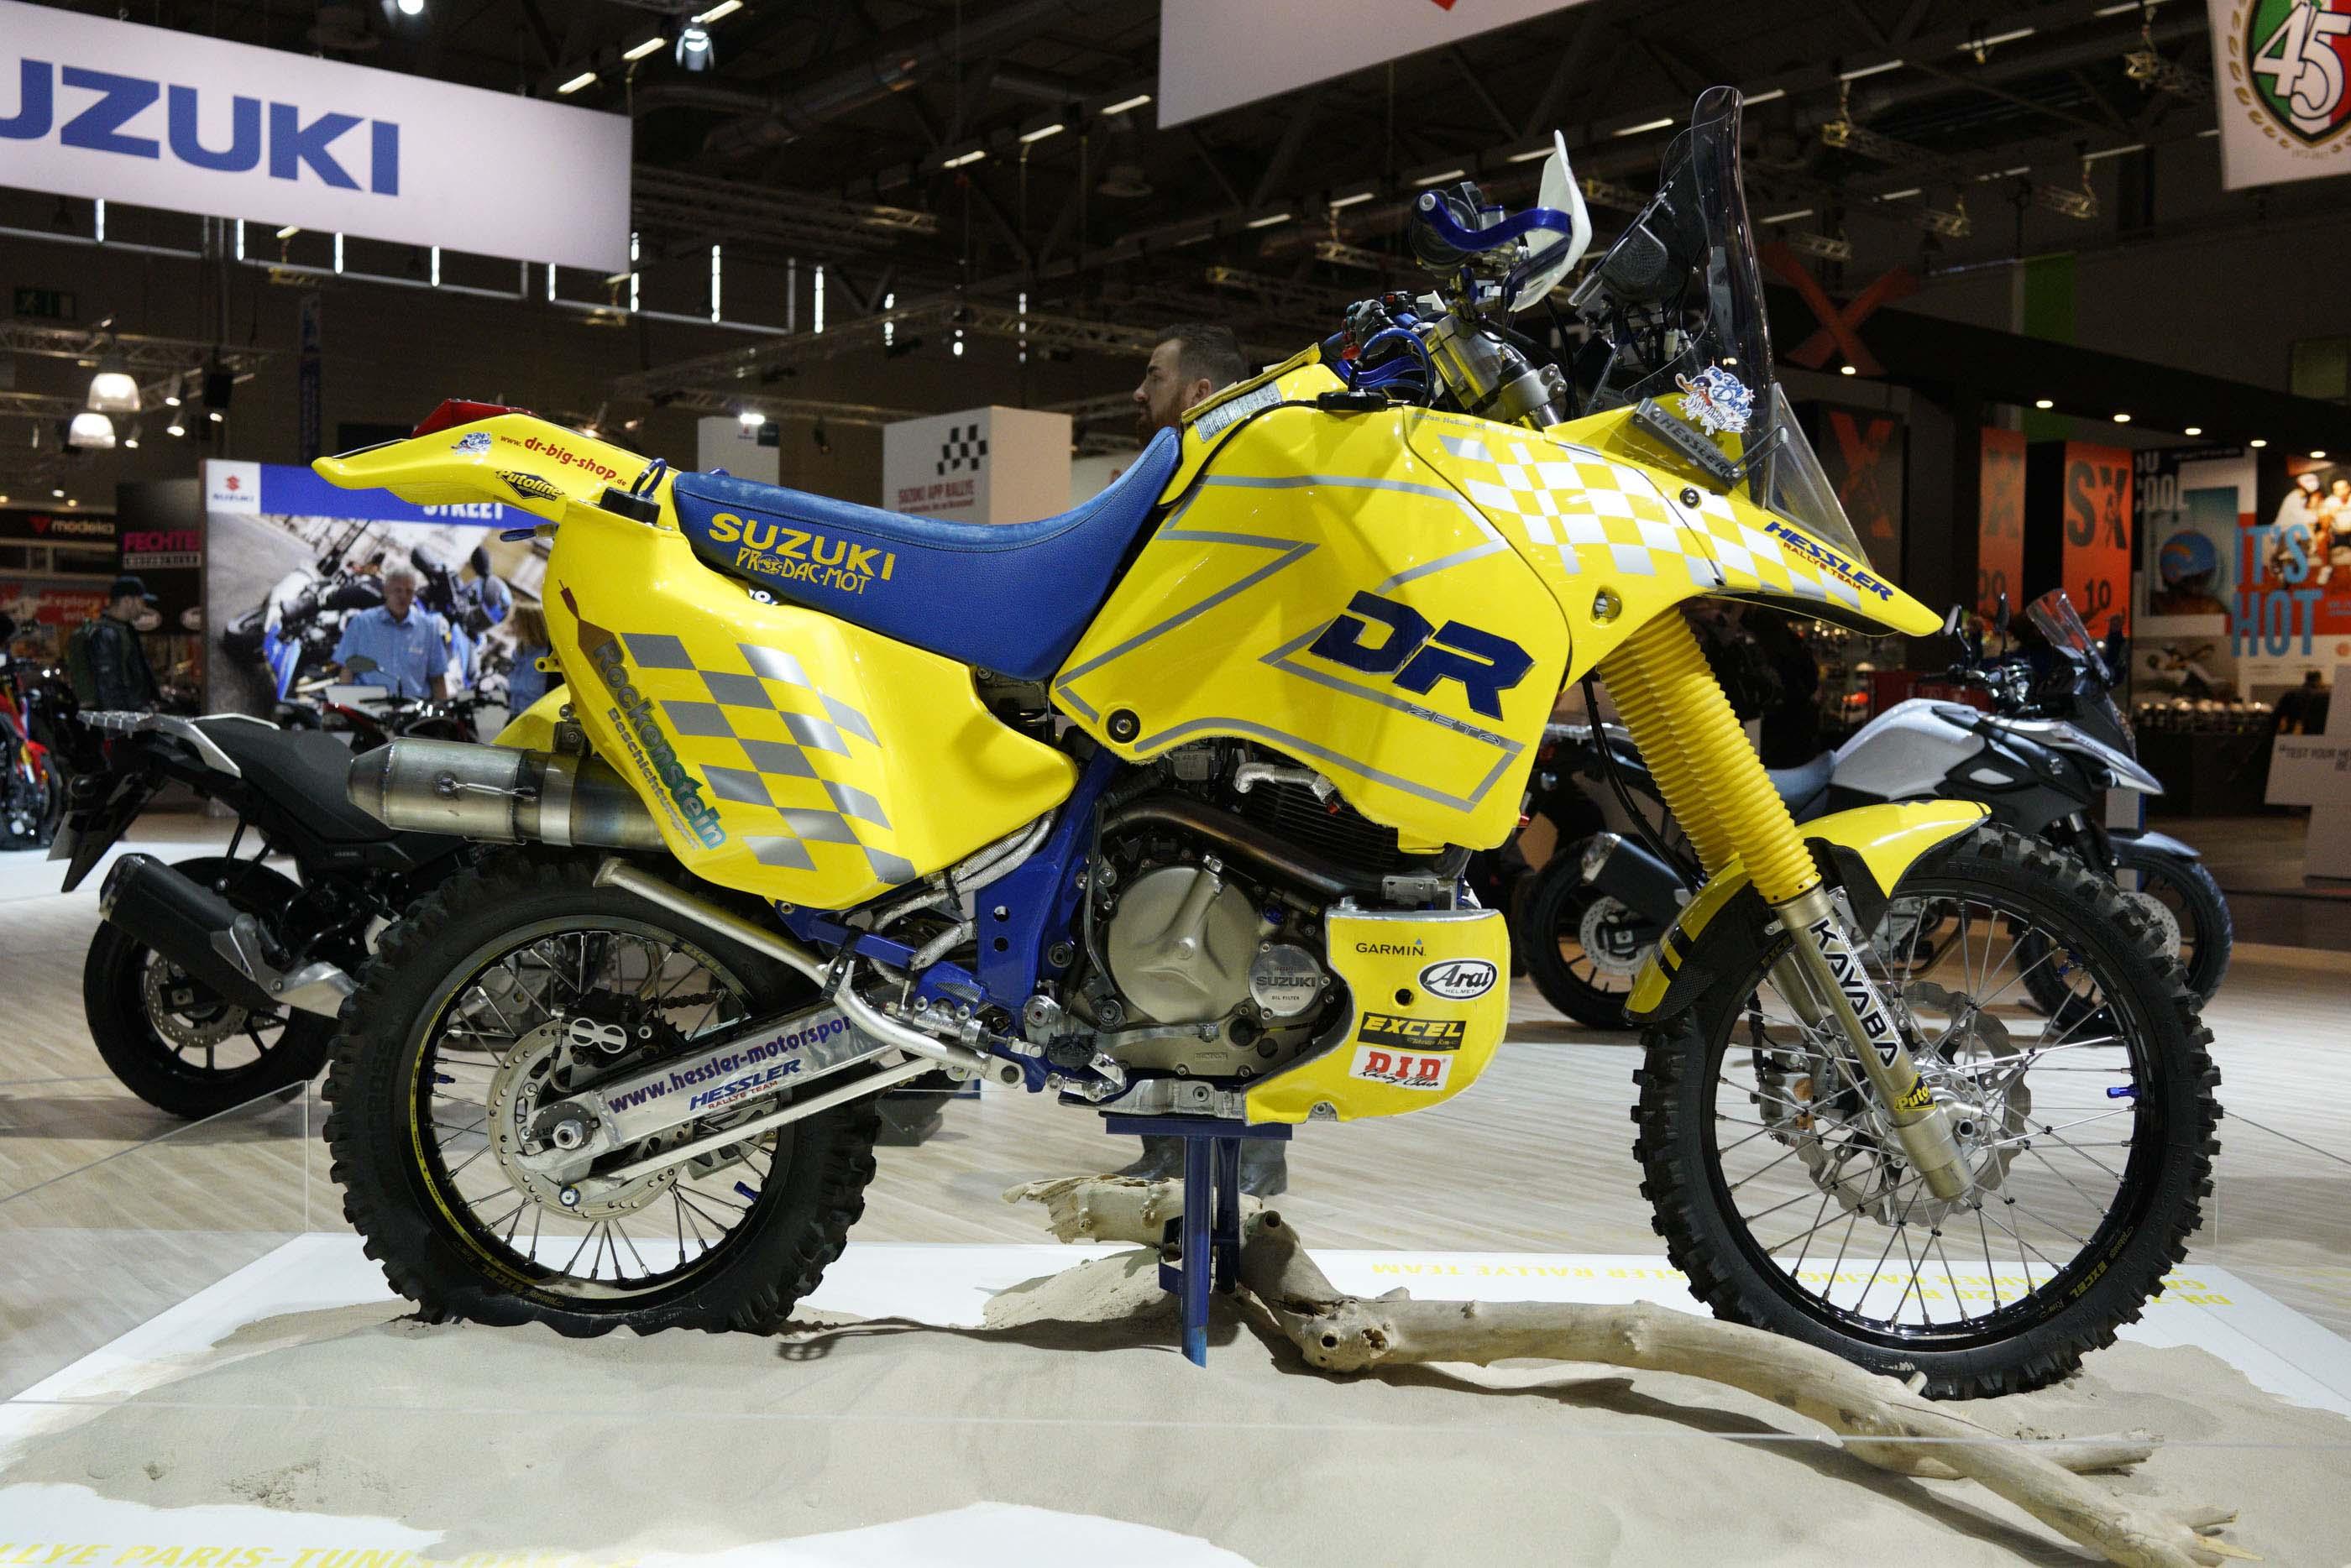 Checkout This Historic Suzuki Dr Z Dakar Rally Race Bike